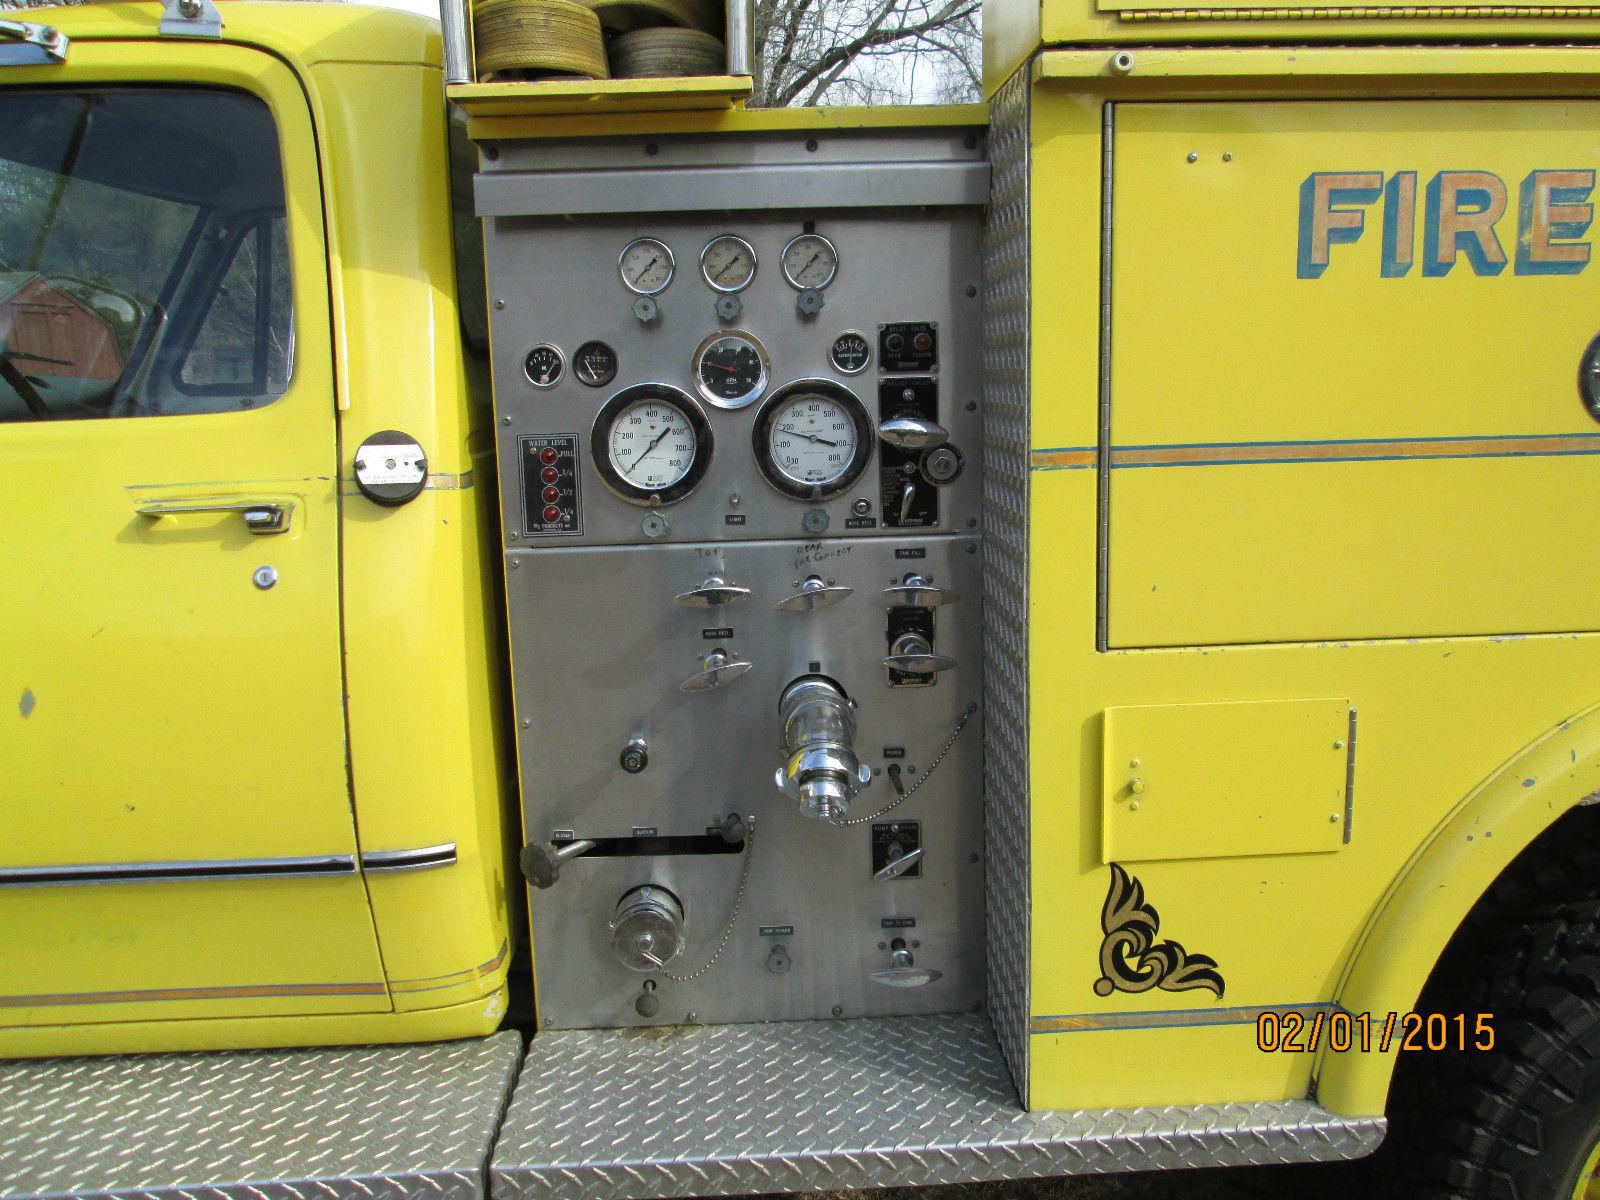 1976 Dodge Power Wagon W300 Mini Pumper Emergency Fire Truck 20943 76 Wiring Schematic Miles